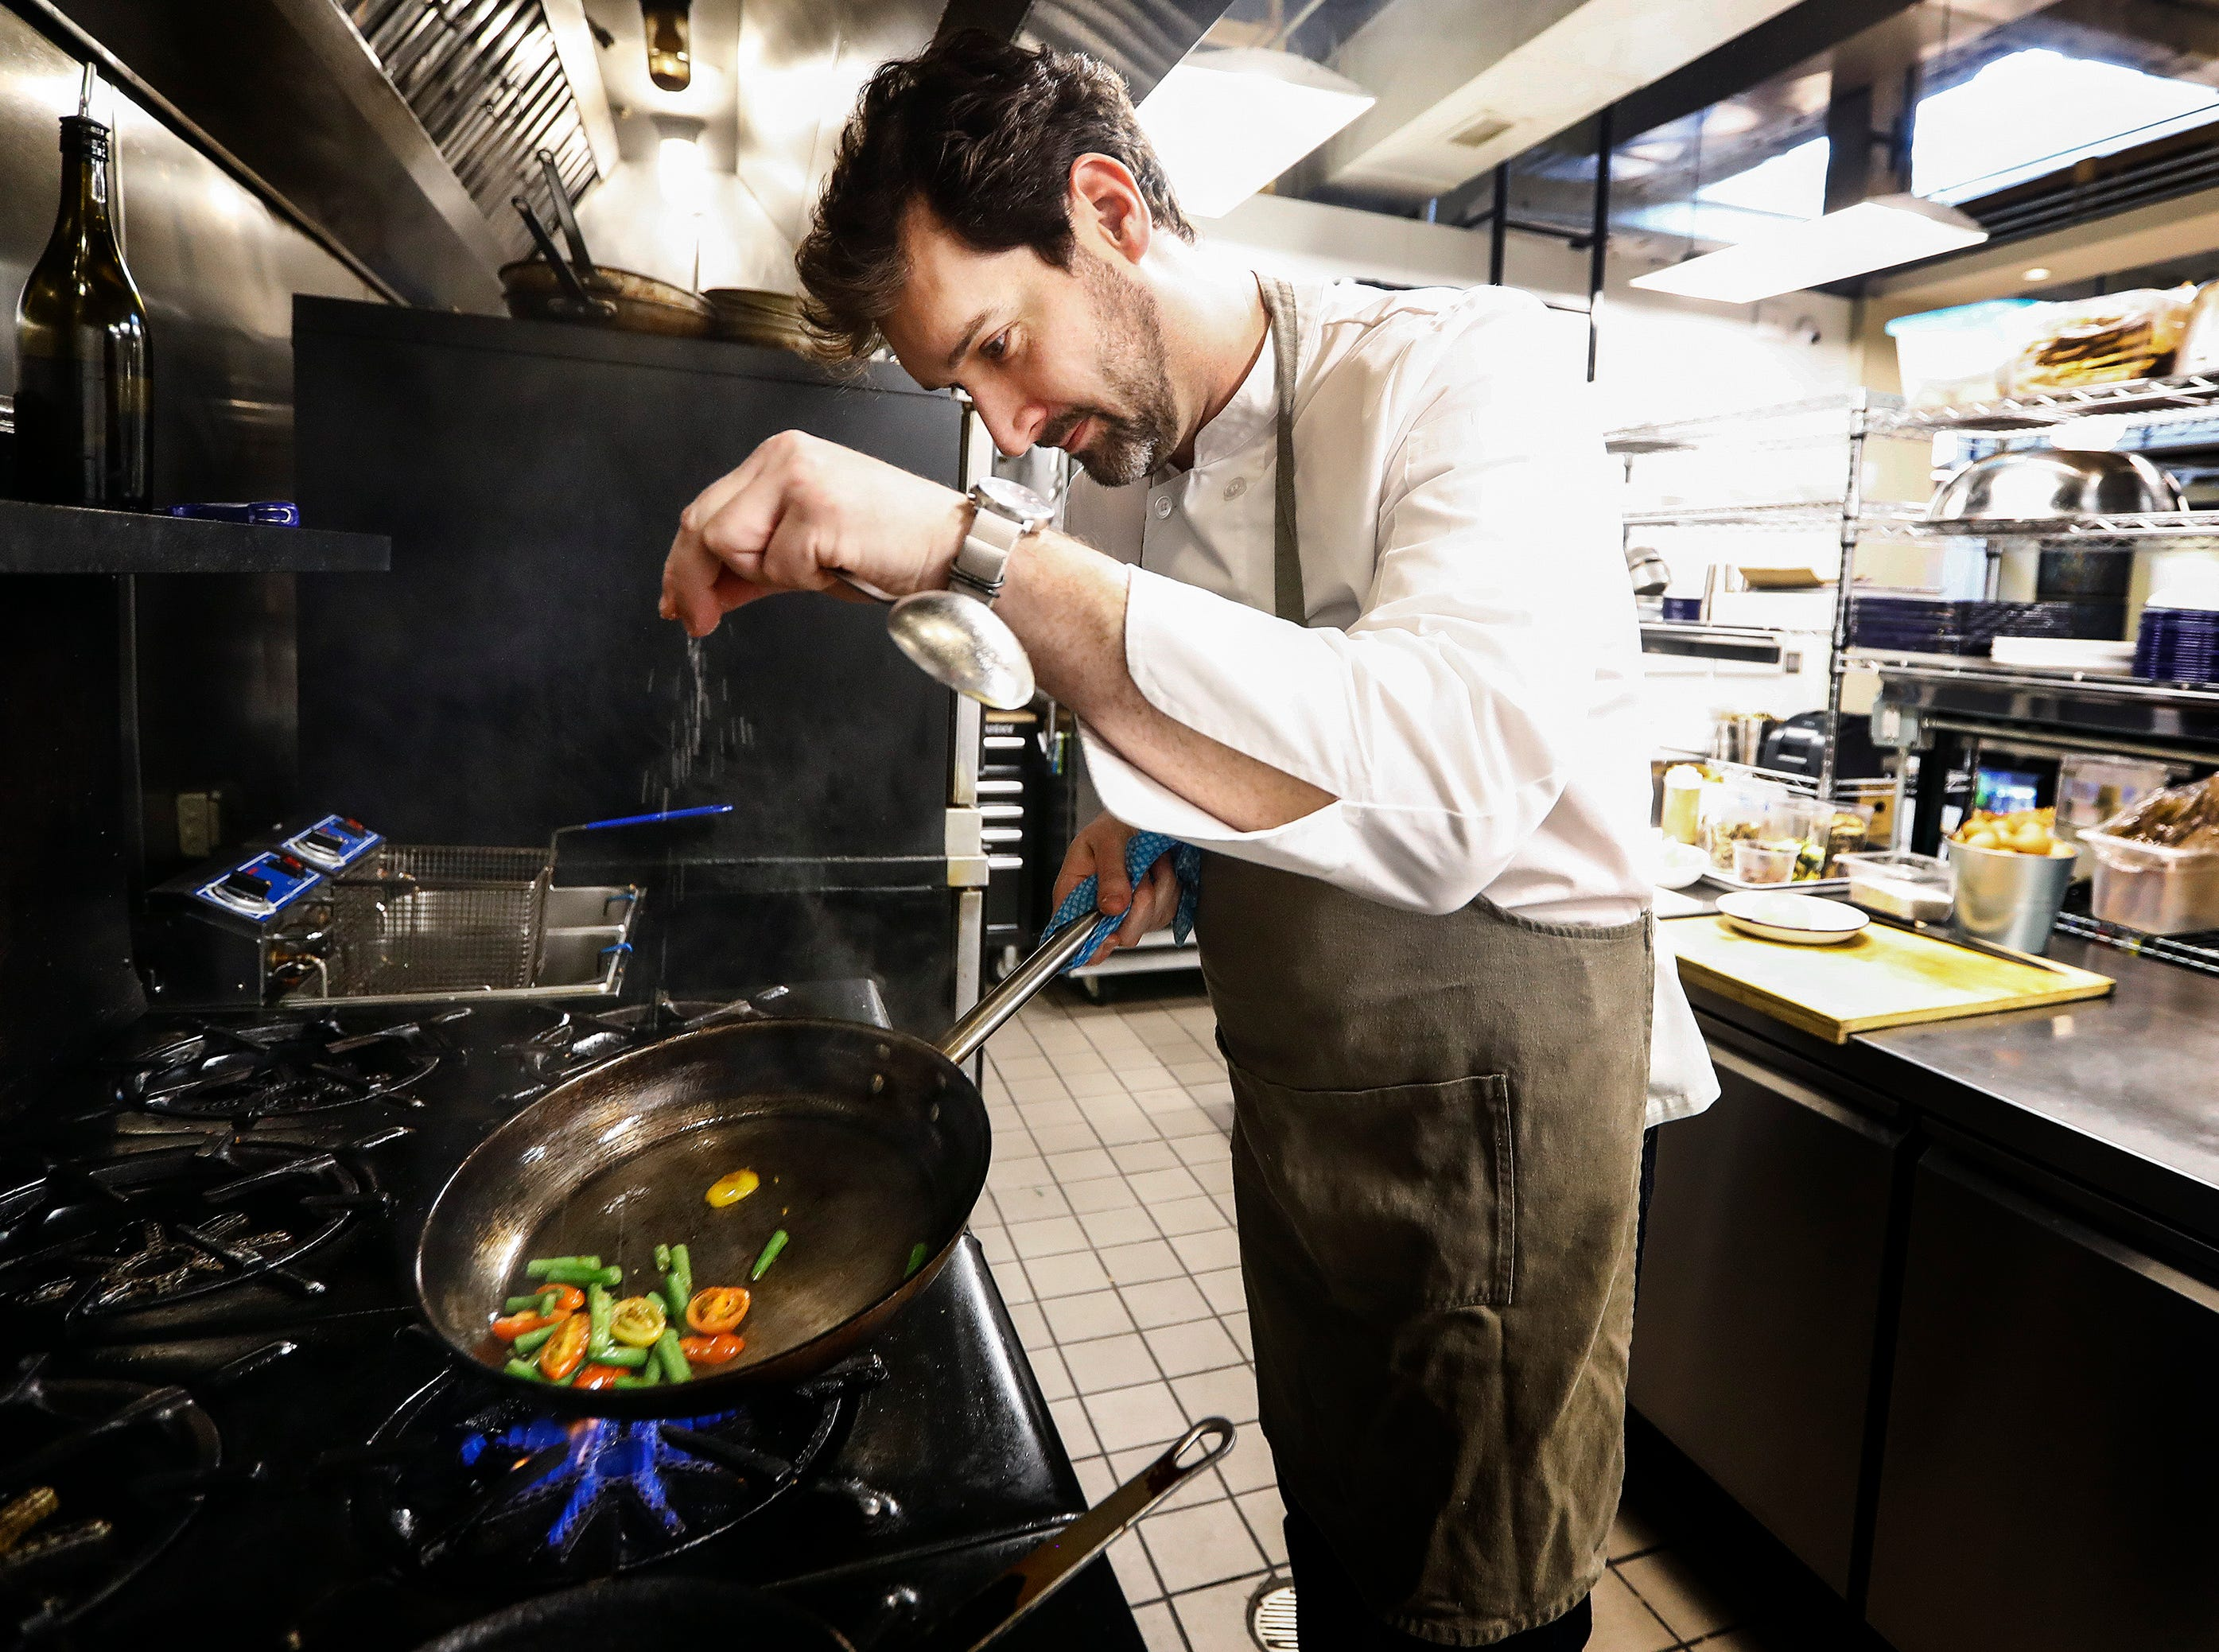 Edge Alley restaurant owner Tim Barker makes the market vegetable pasta dish.